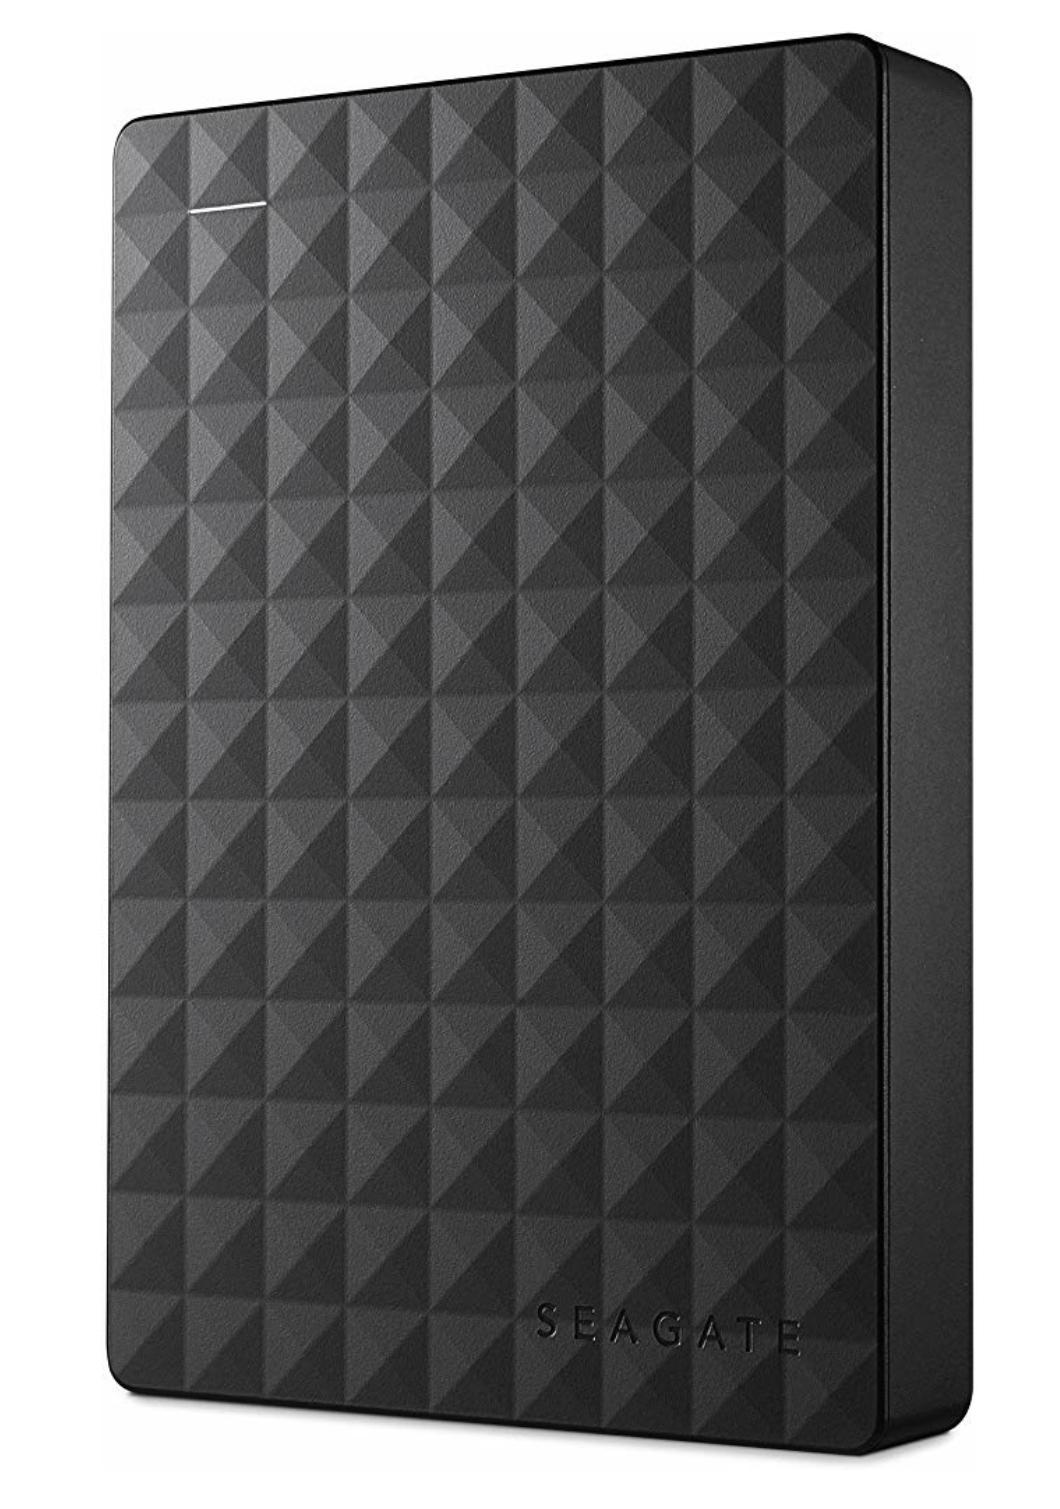 Seagate Expansion Portable 4 TB externe tragbare Festplatte für PC, Xbox und PS4 6,35 cm (2,5 Zoll)